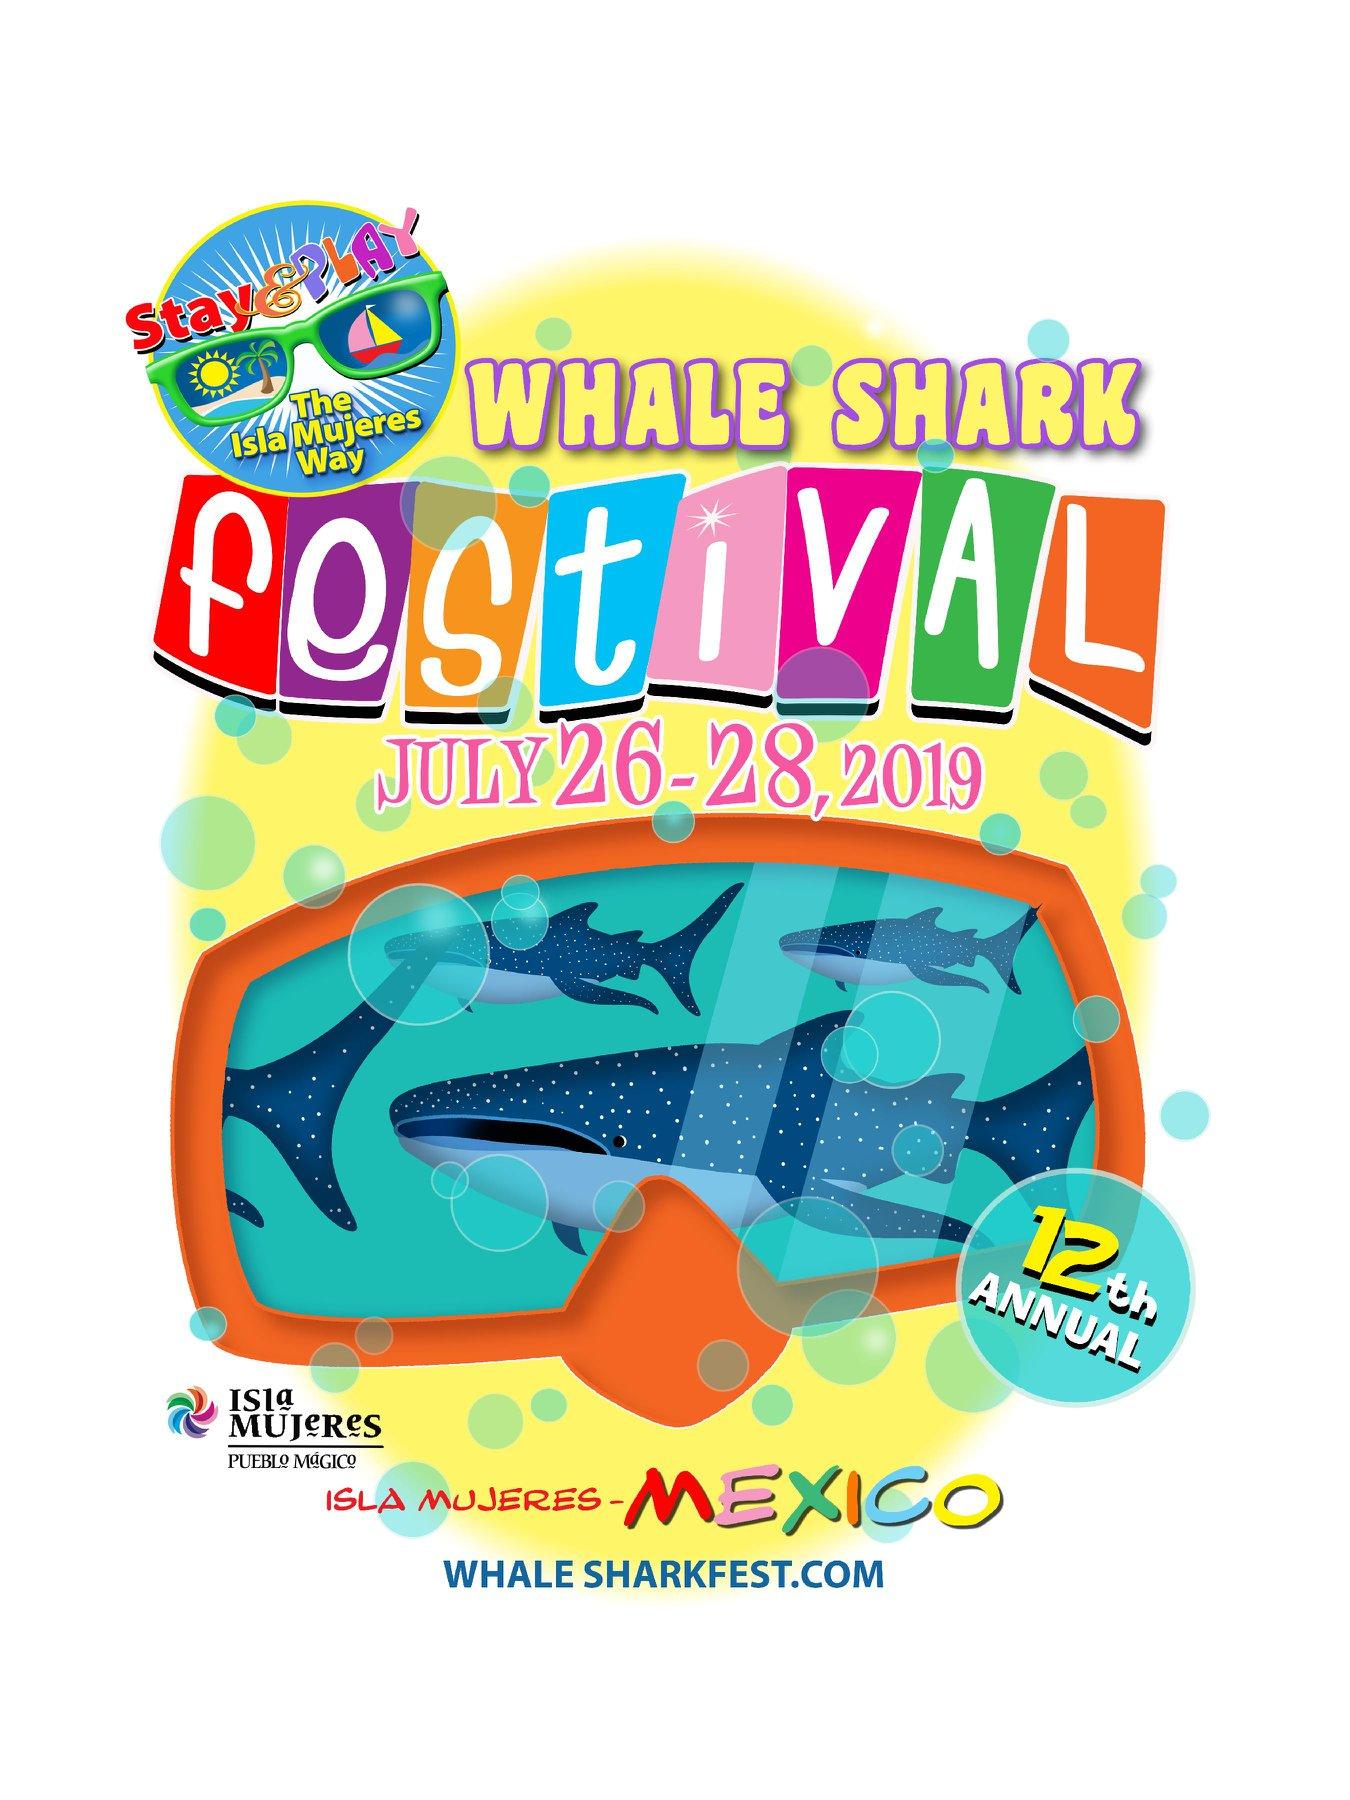 Etradewire News Isla Mujeres Whale Shark Festival